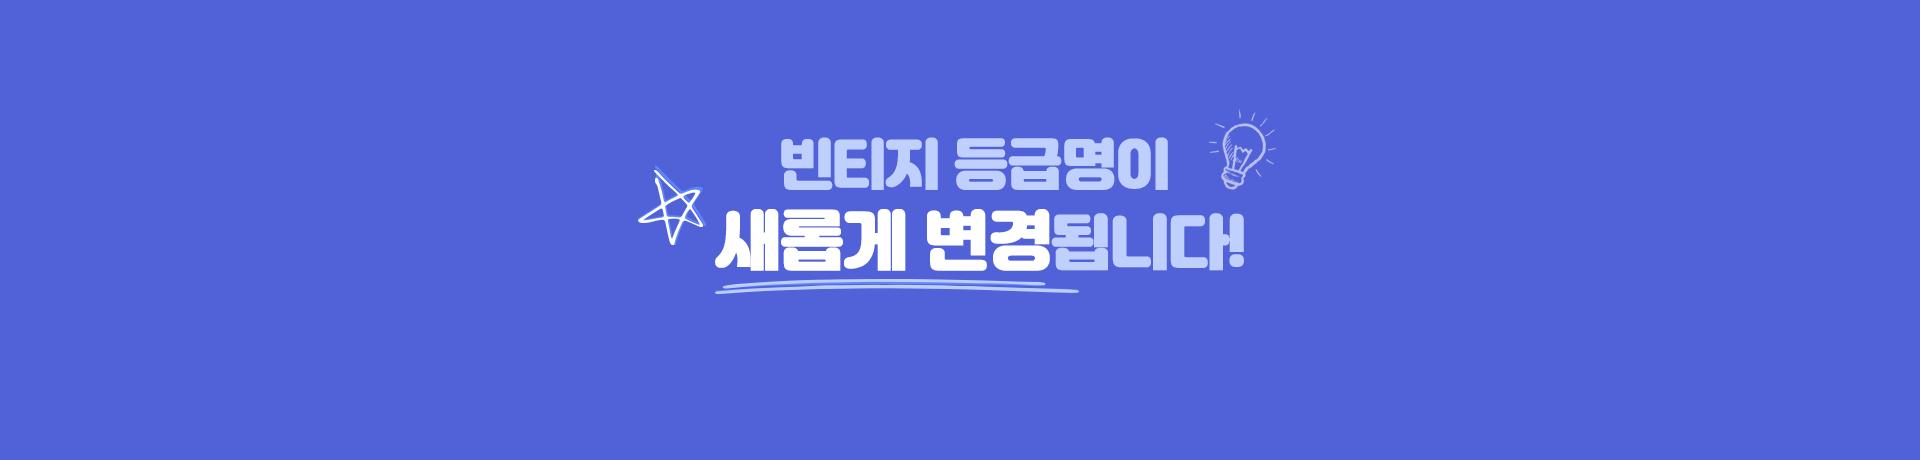 210406_yh_customer_rank_pc-_5161d8